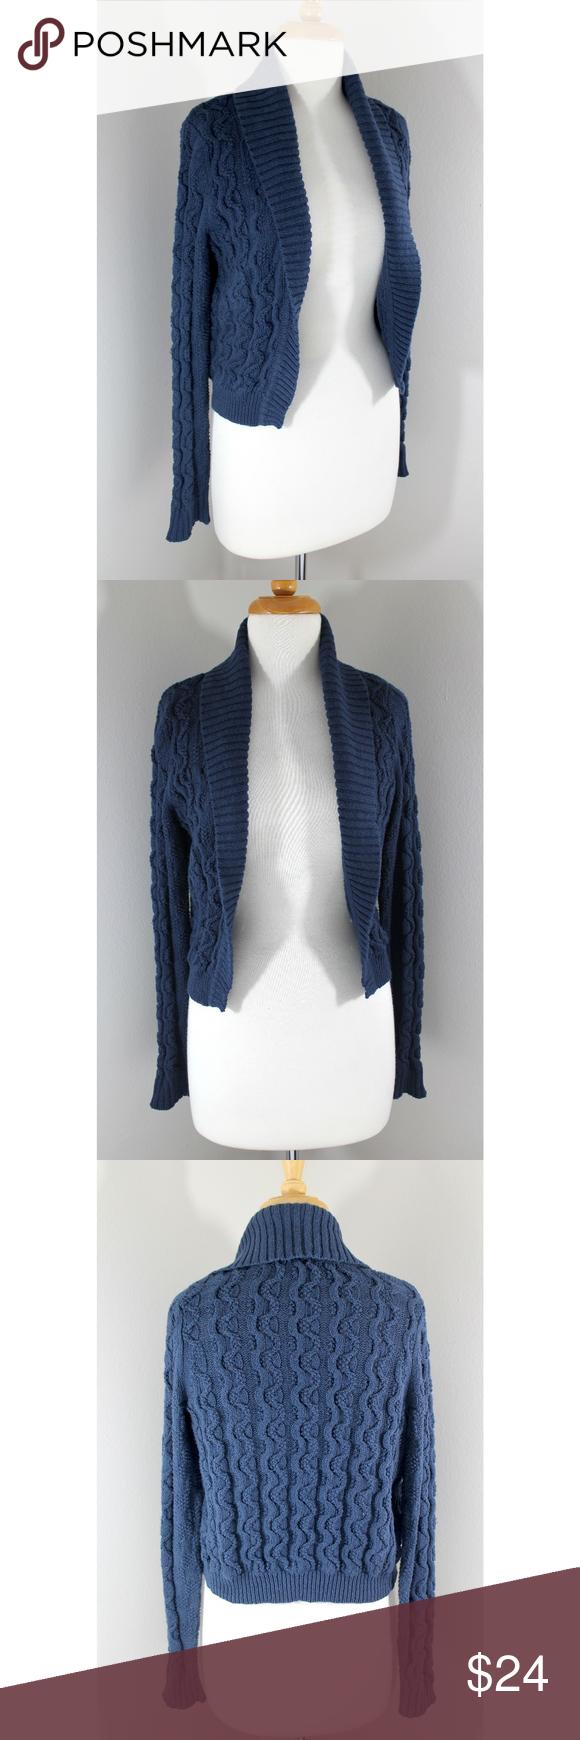 Anthropologie Sz XL Navy Blue Cardigan Sweater   Navy blue ...